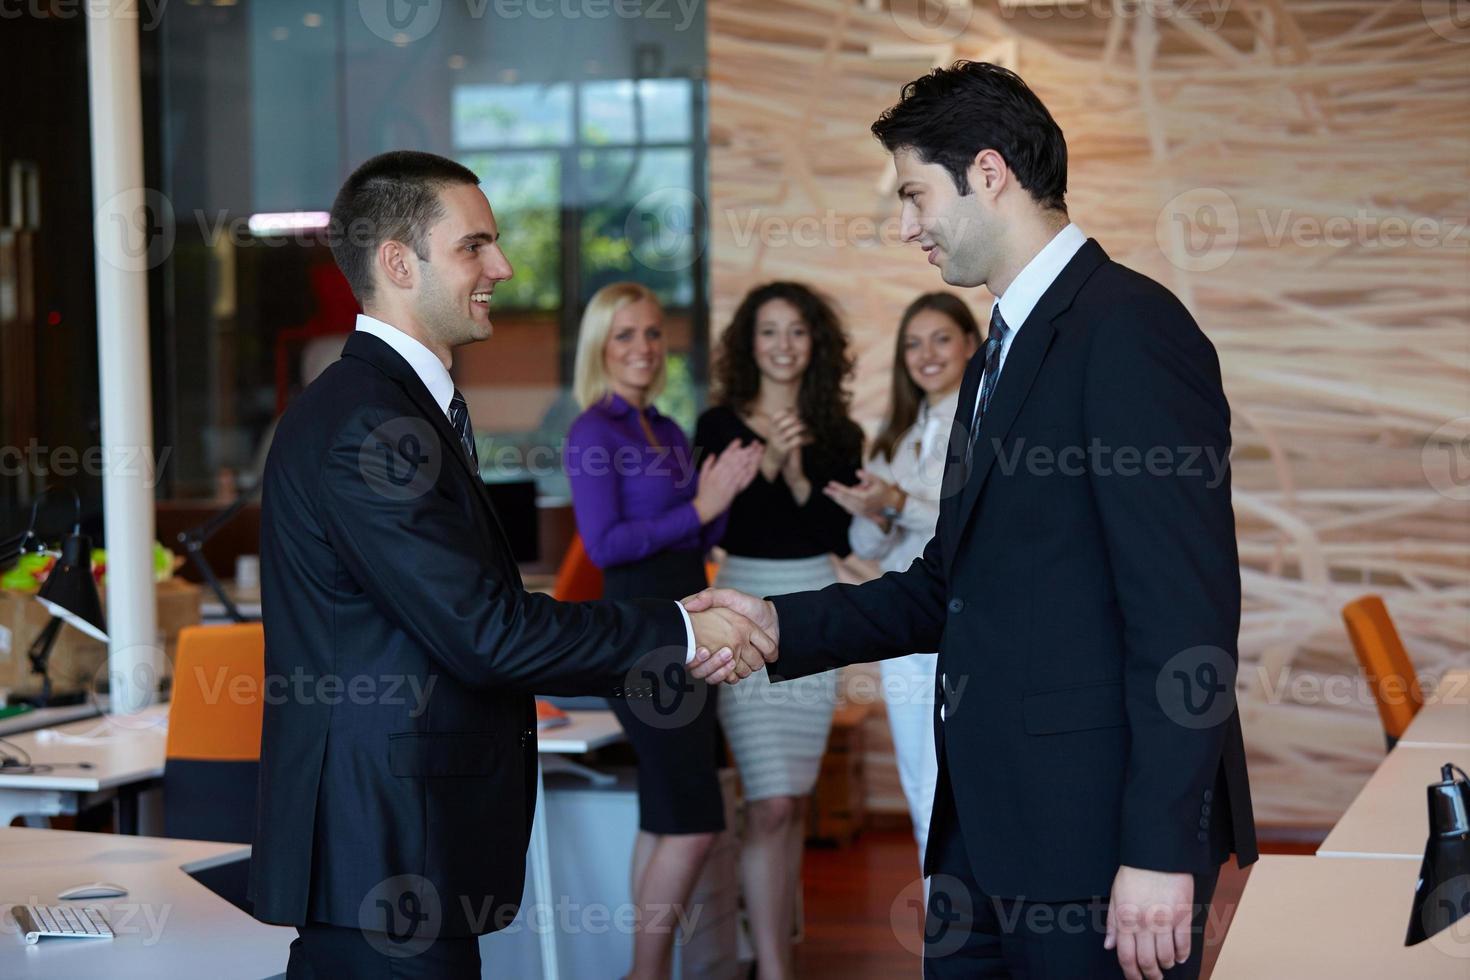 Geschäftsleute Händeschütteln foto